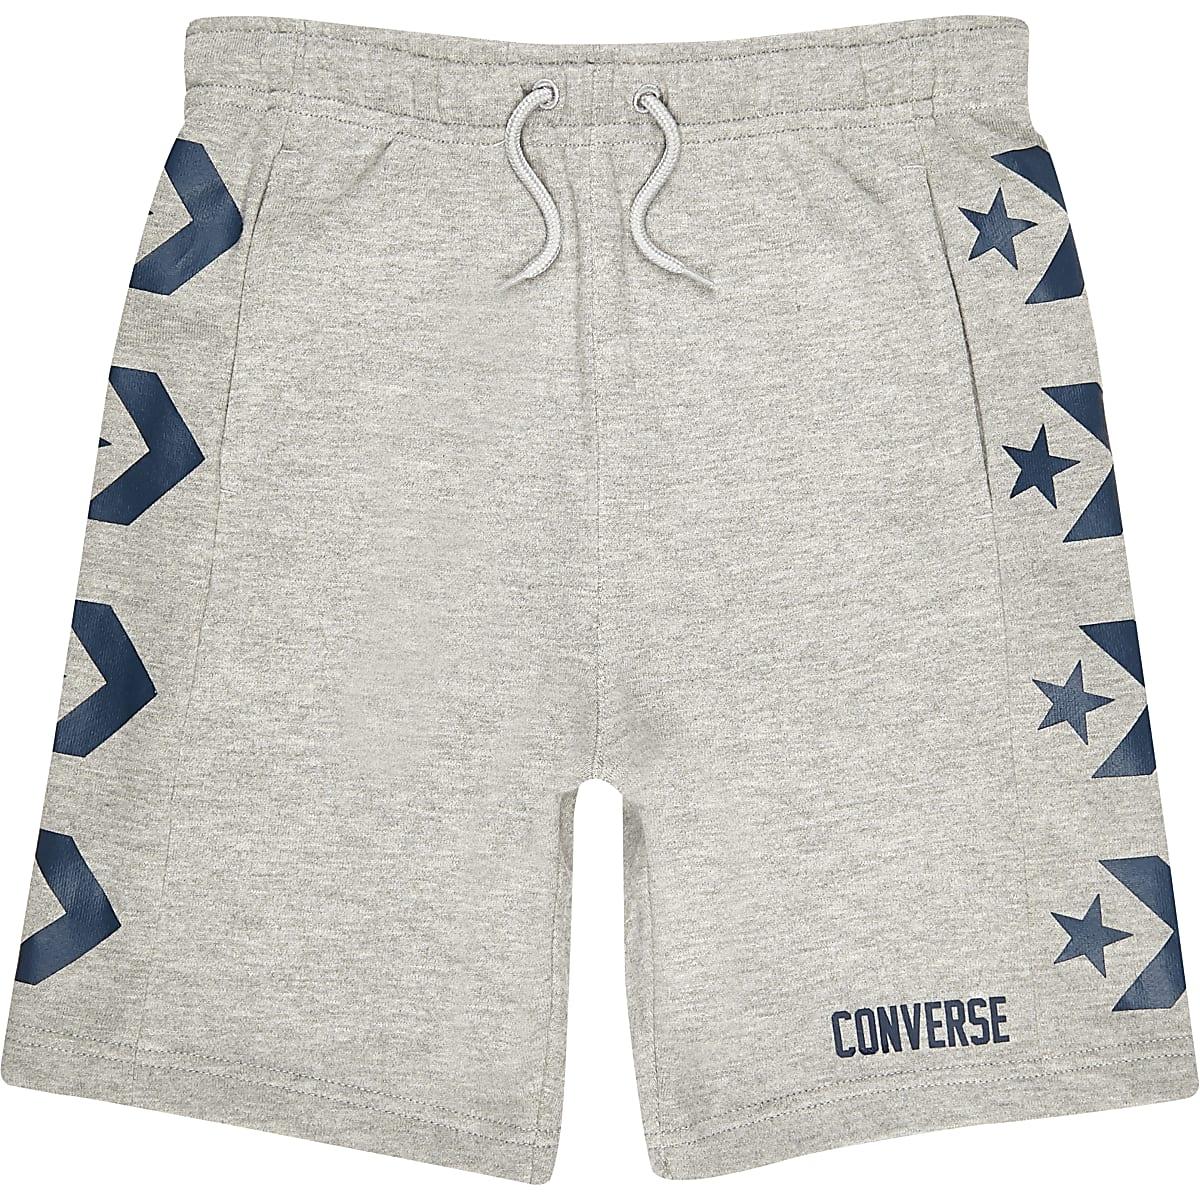 Converse – Graue Jersey-Shorts mit Logo